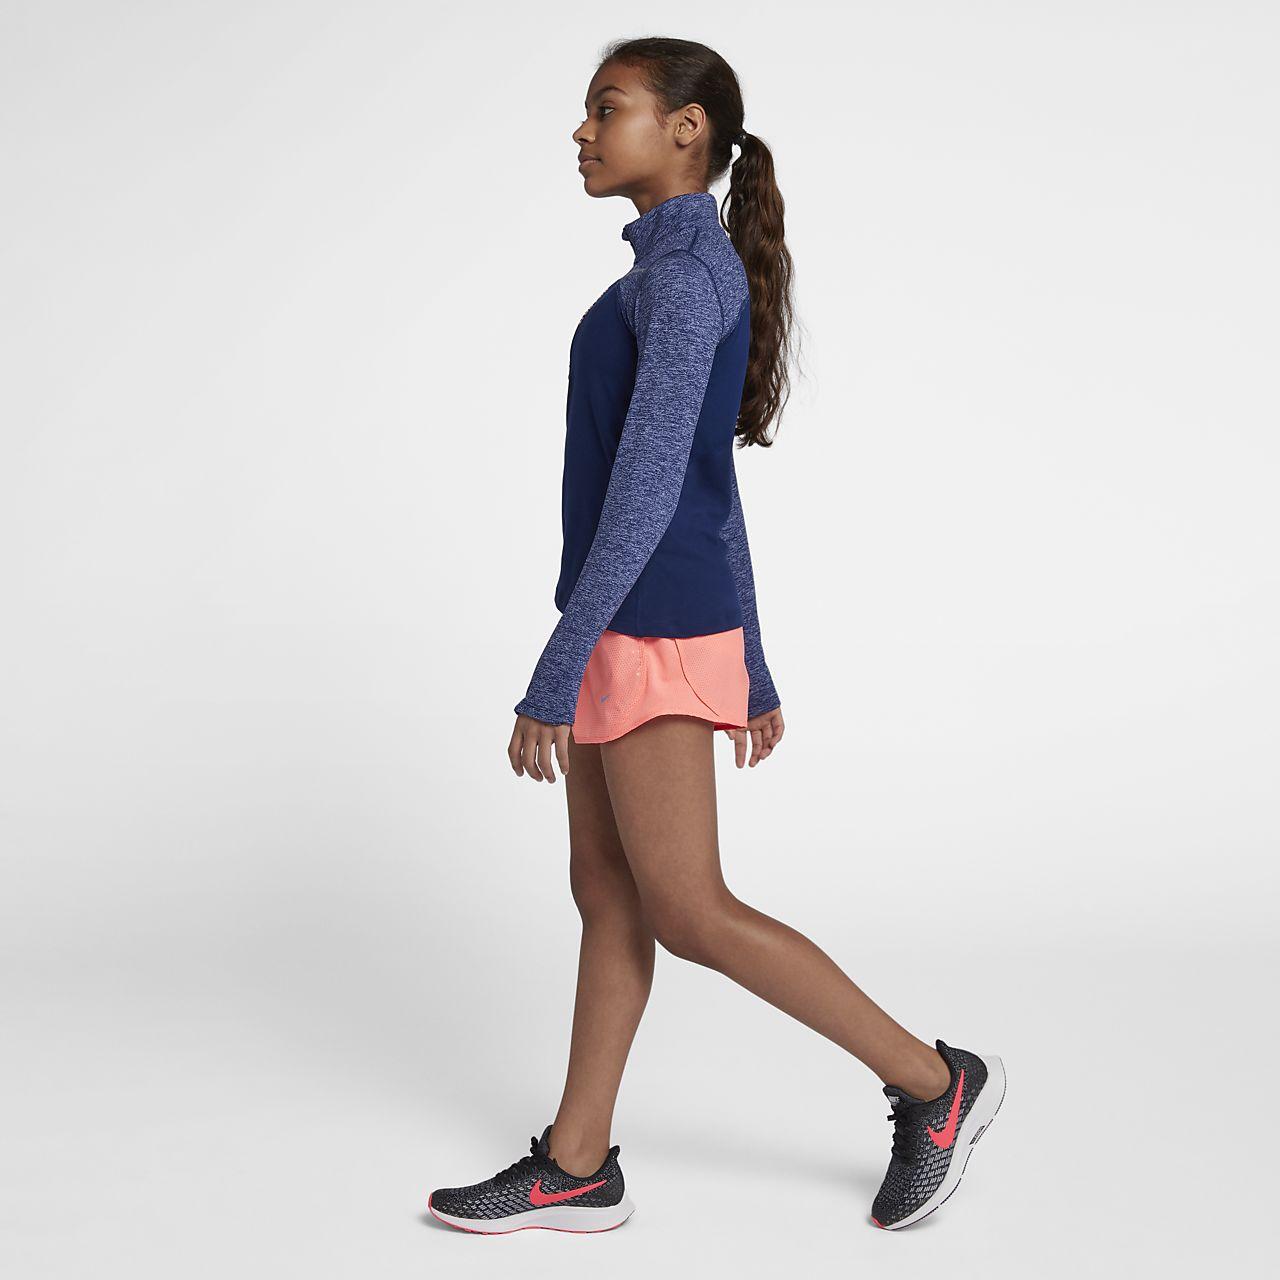 3c407c86ce2d Nike Dri-FIT Older Kids  (Girls ) Half-Zip Running Top. Nike.com AU